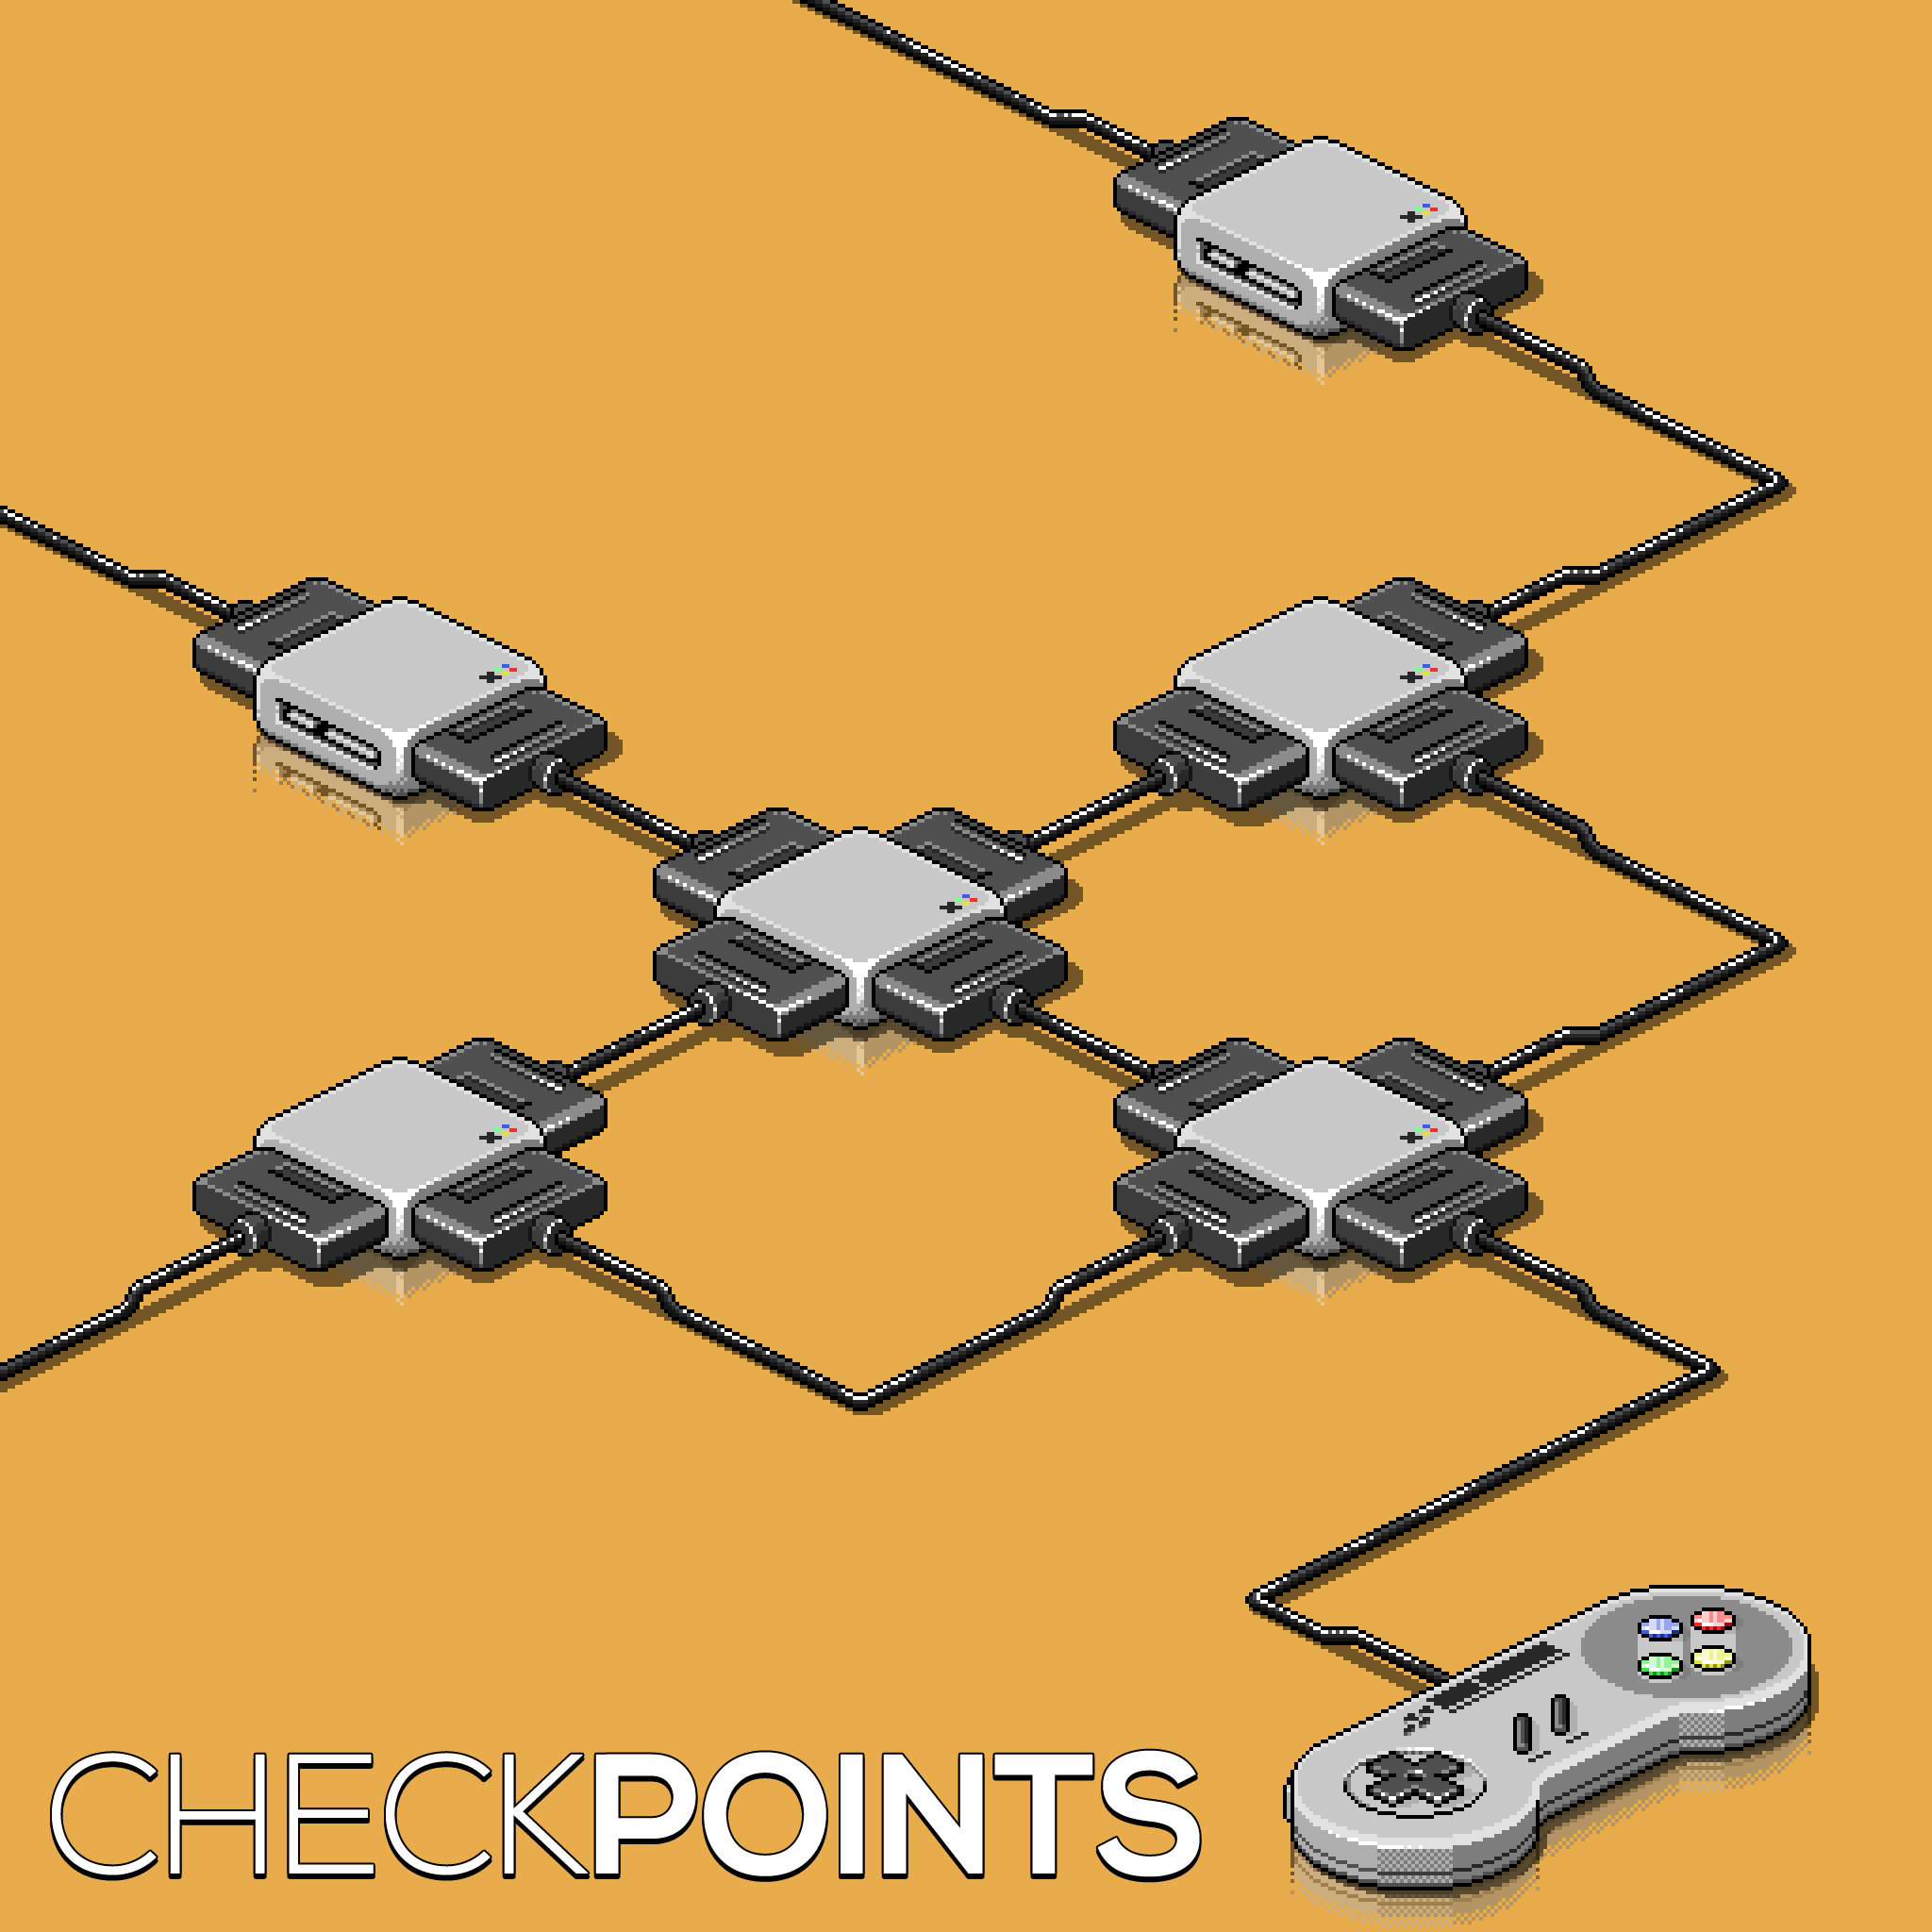 checkpoints final SNES v2e 2048.png